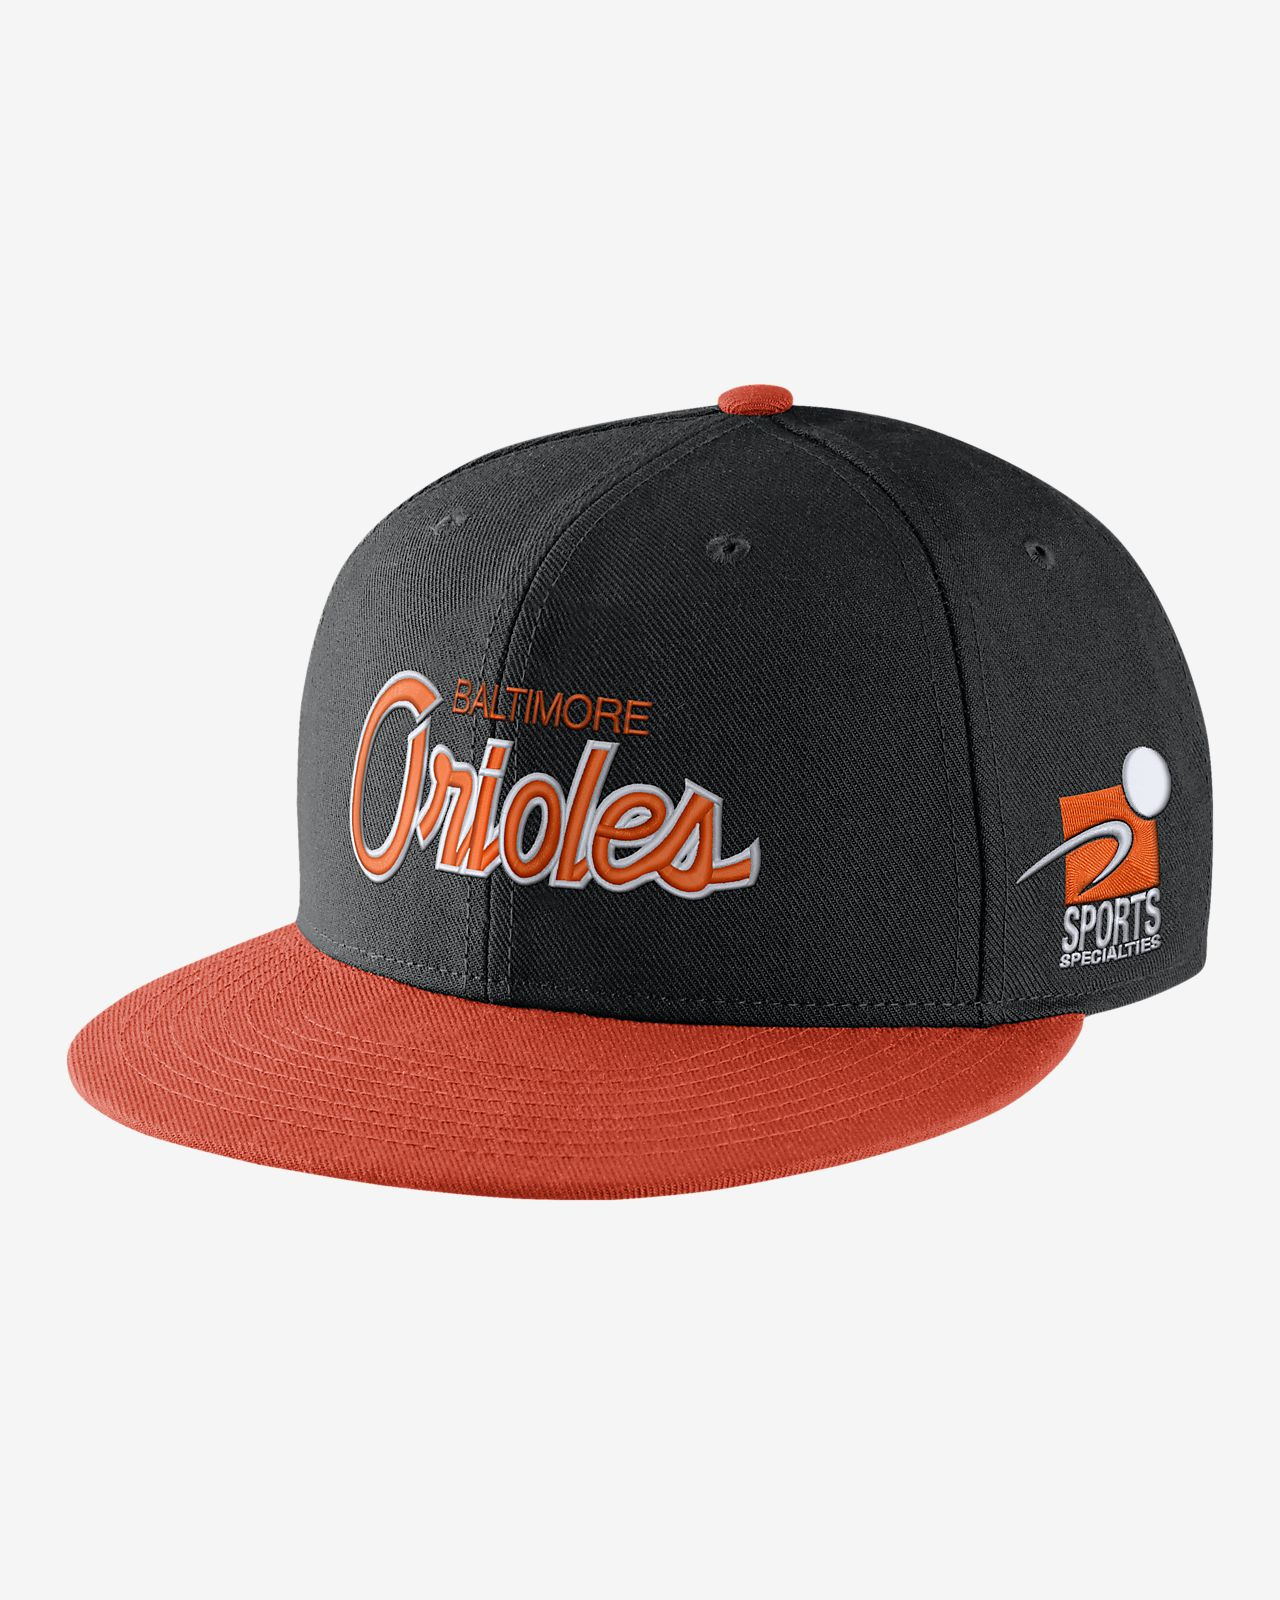 Nike Pro Sport Specialties (MLB Orioles) Adjustable Hat